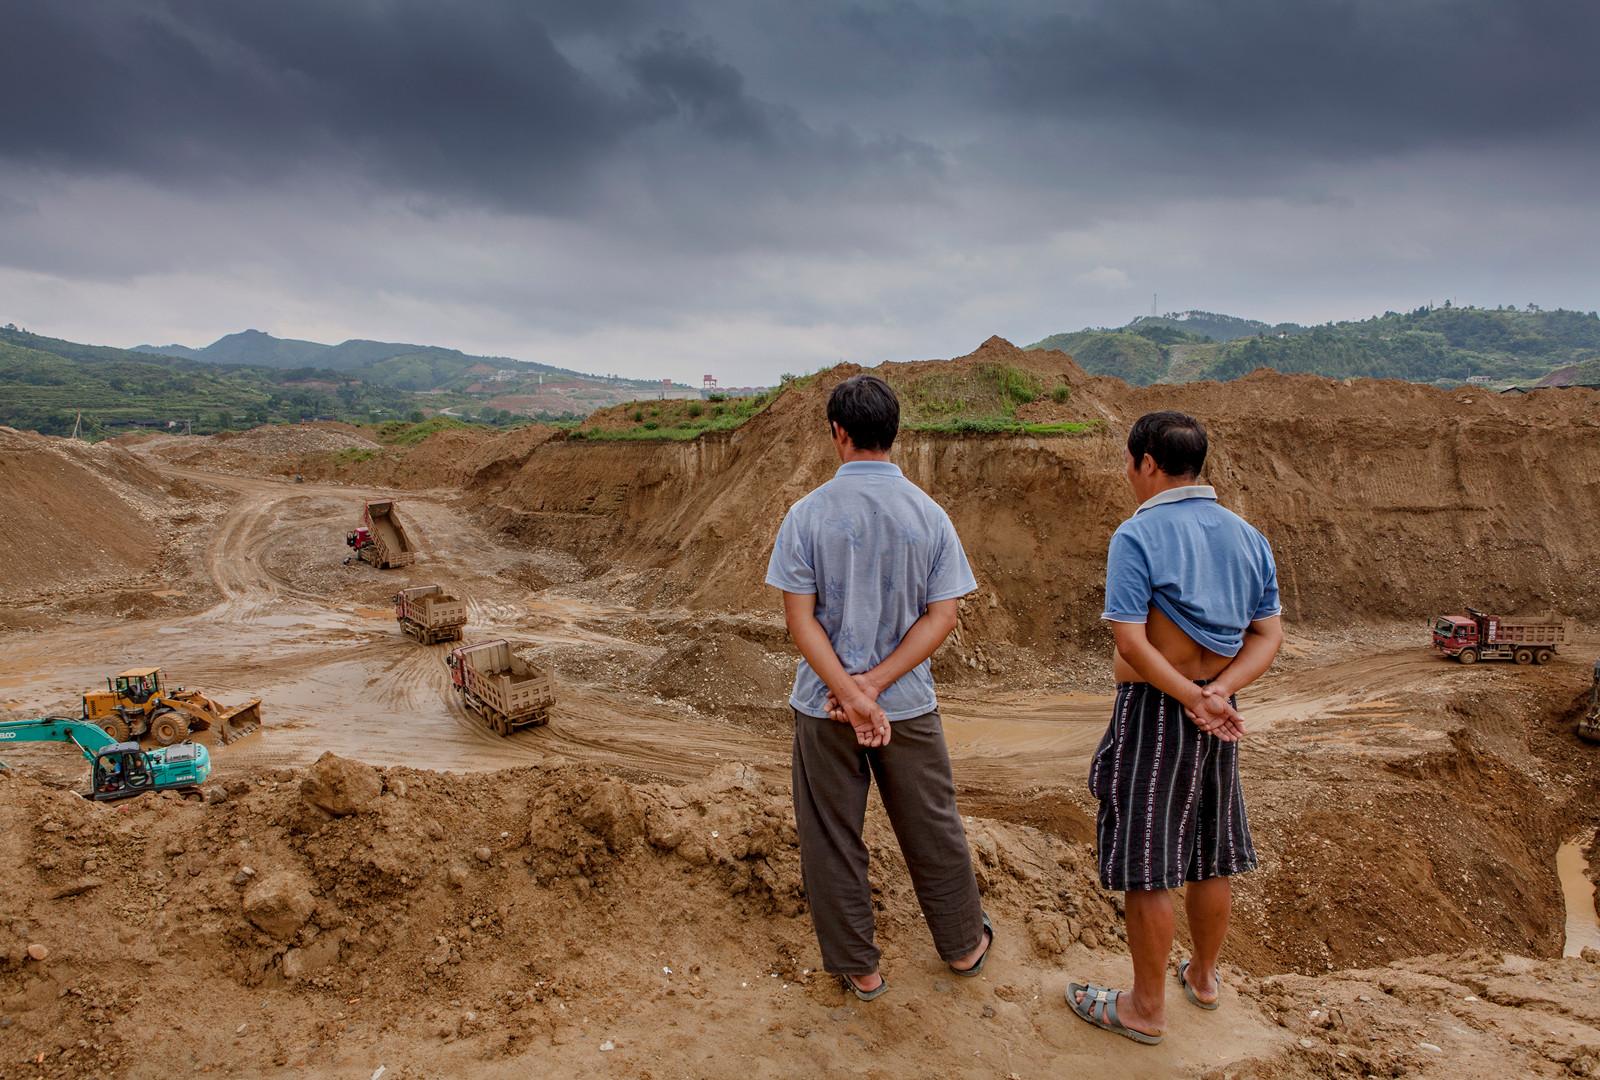 kuang-huimin-lost-dreams-in-tuokou-photography-of-china-6.jpg